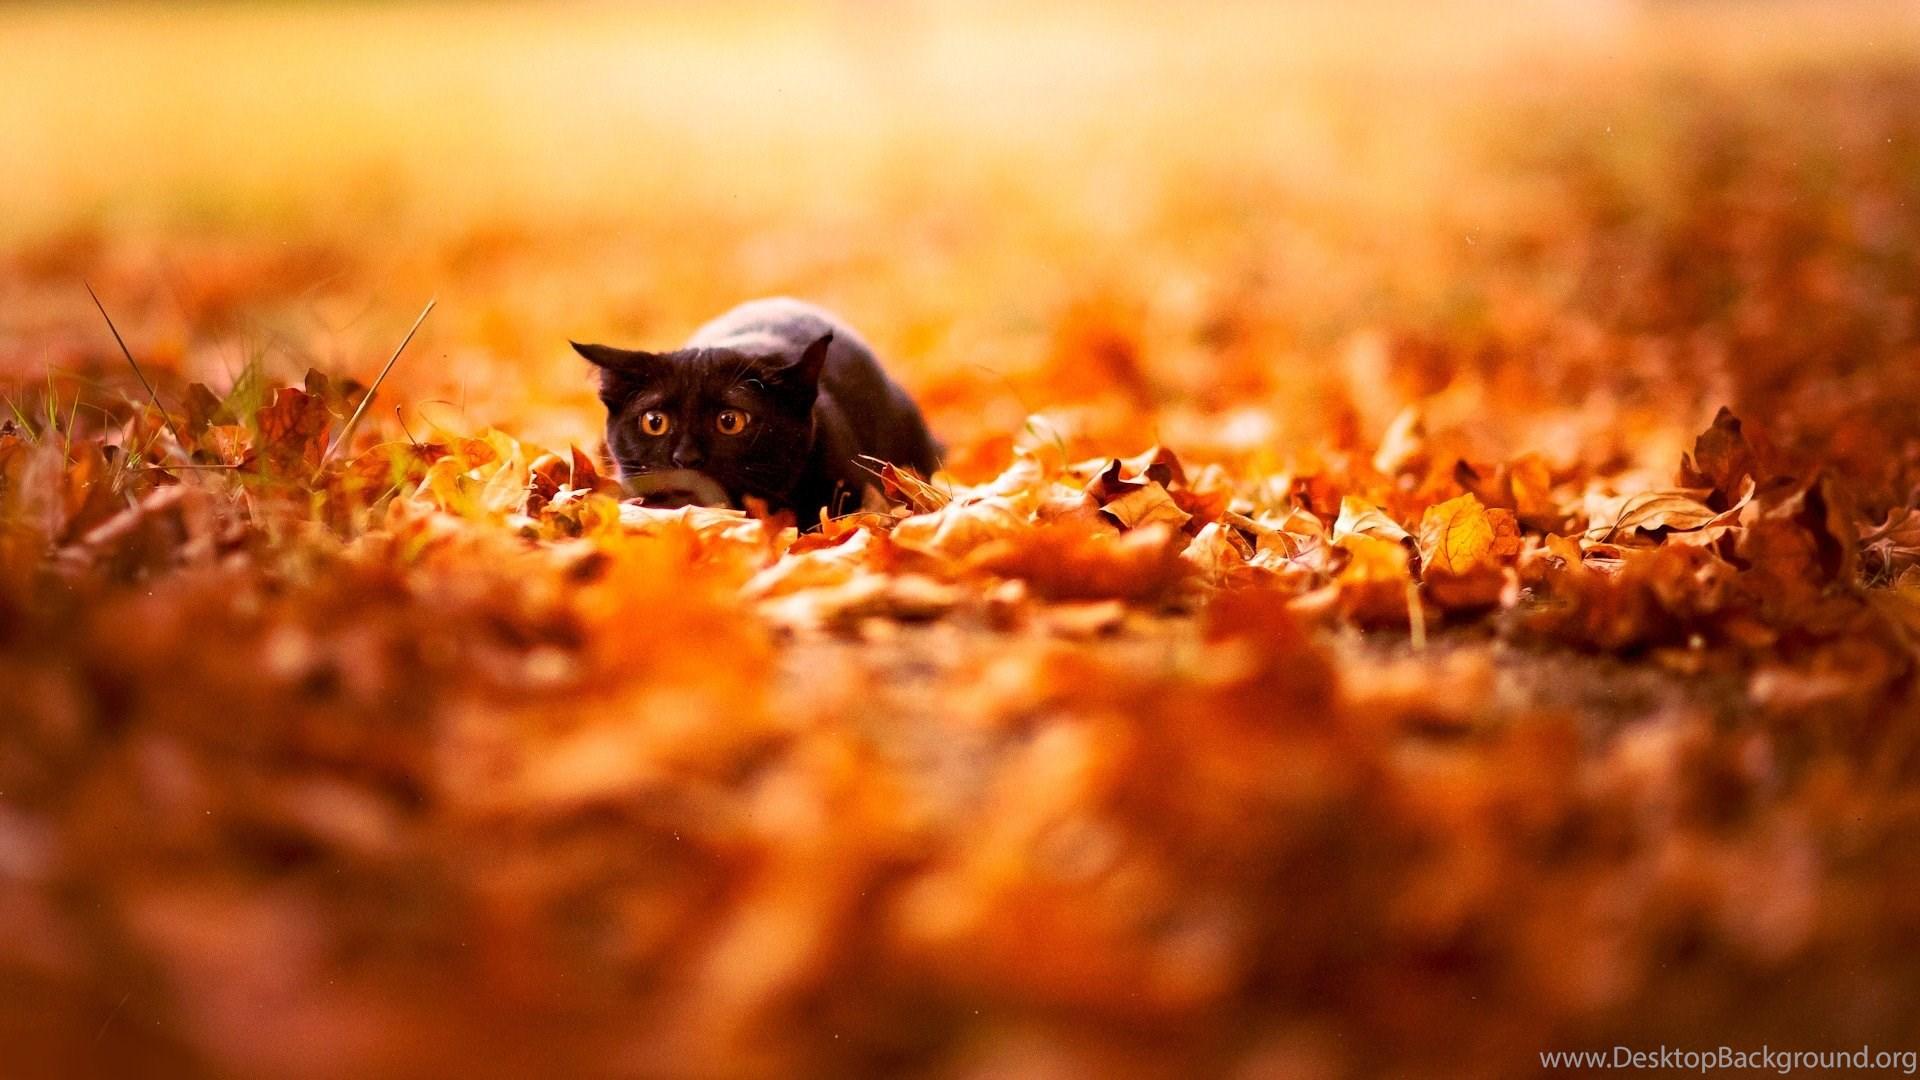 Cute Black Cat Wallpapers Desktop Background